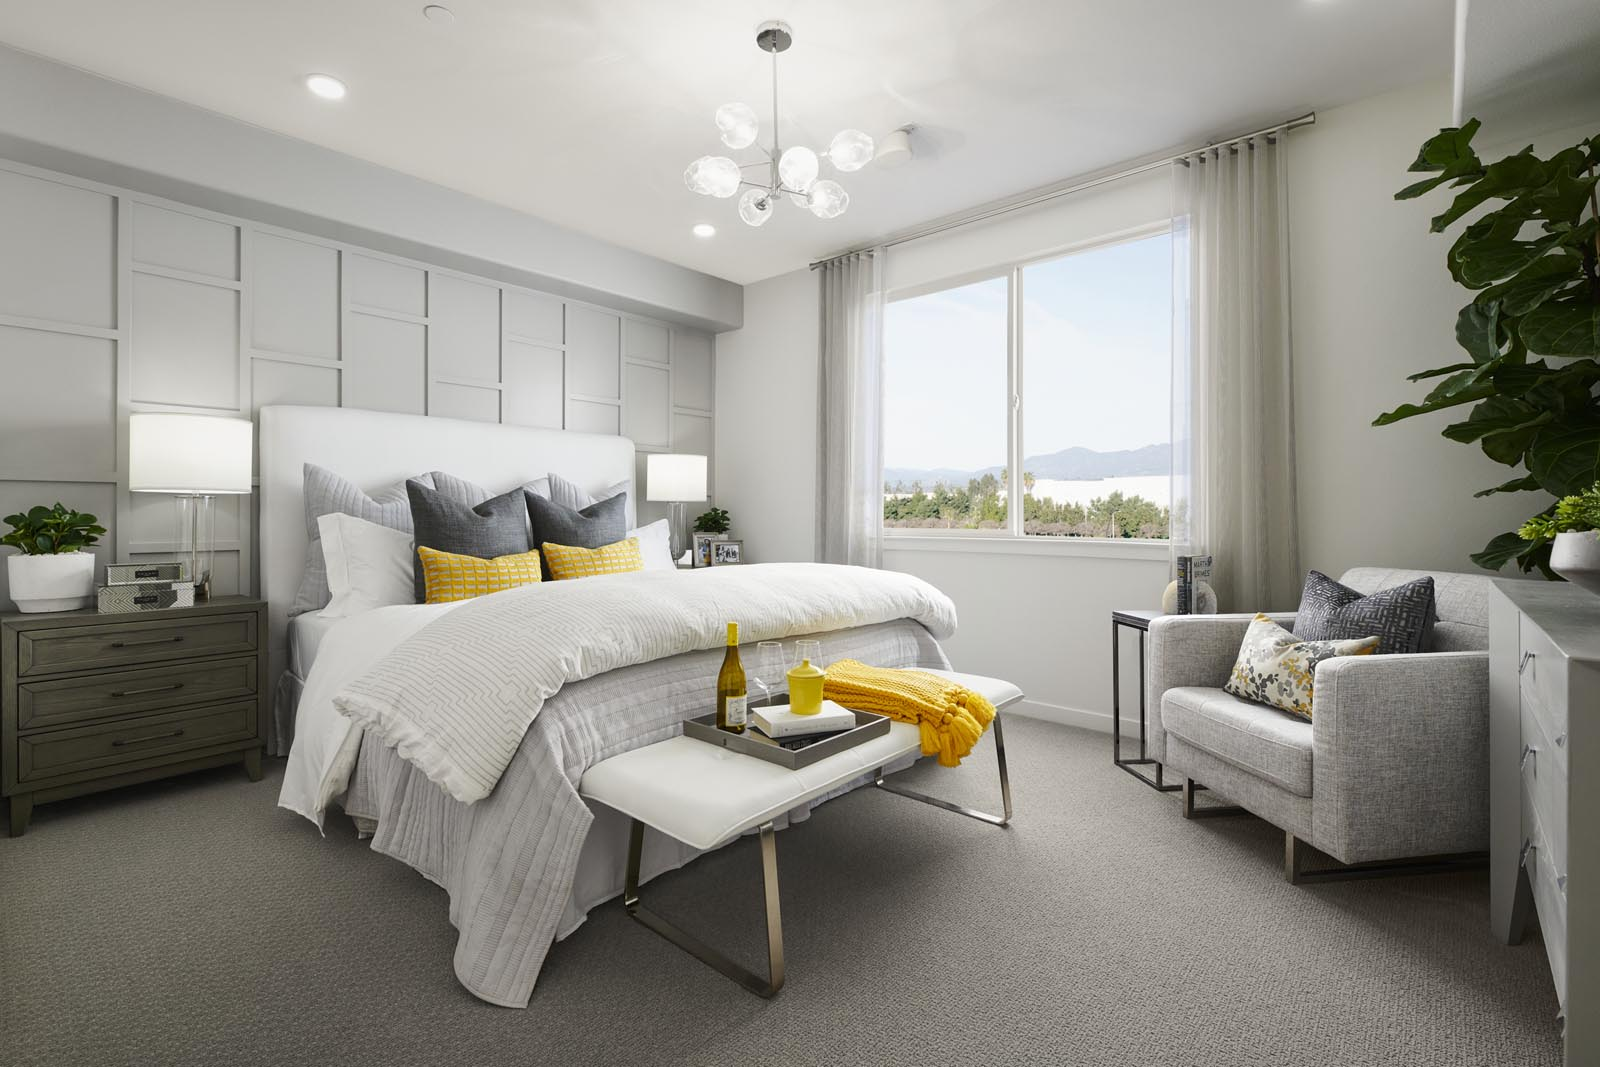 Master Bedroom   Residence 1   Aspire   New Homes in Rancho Cucamonga, CA   Van Daele Homes